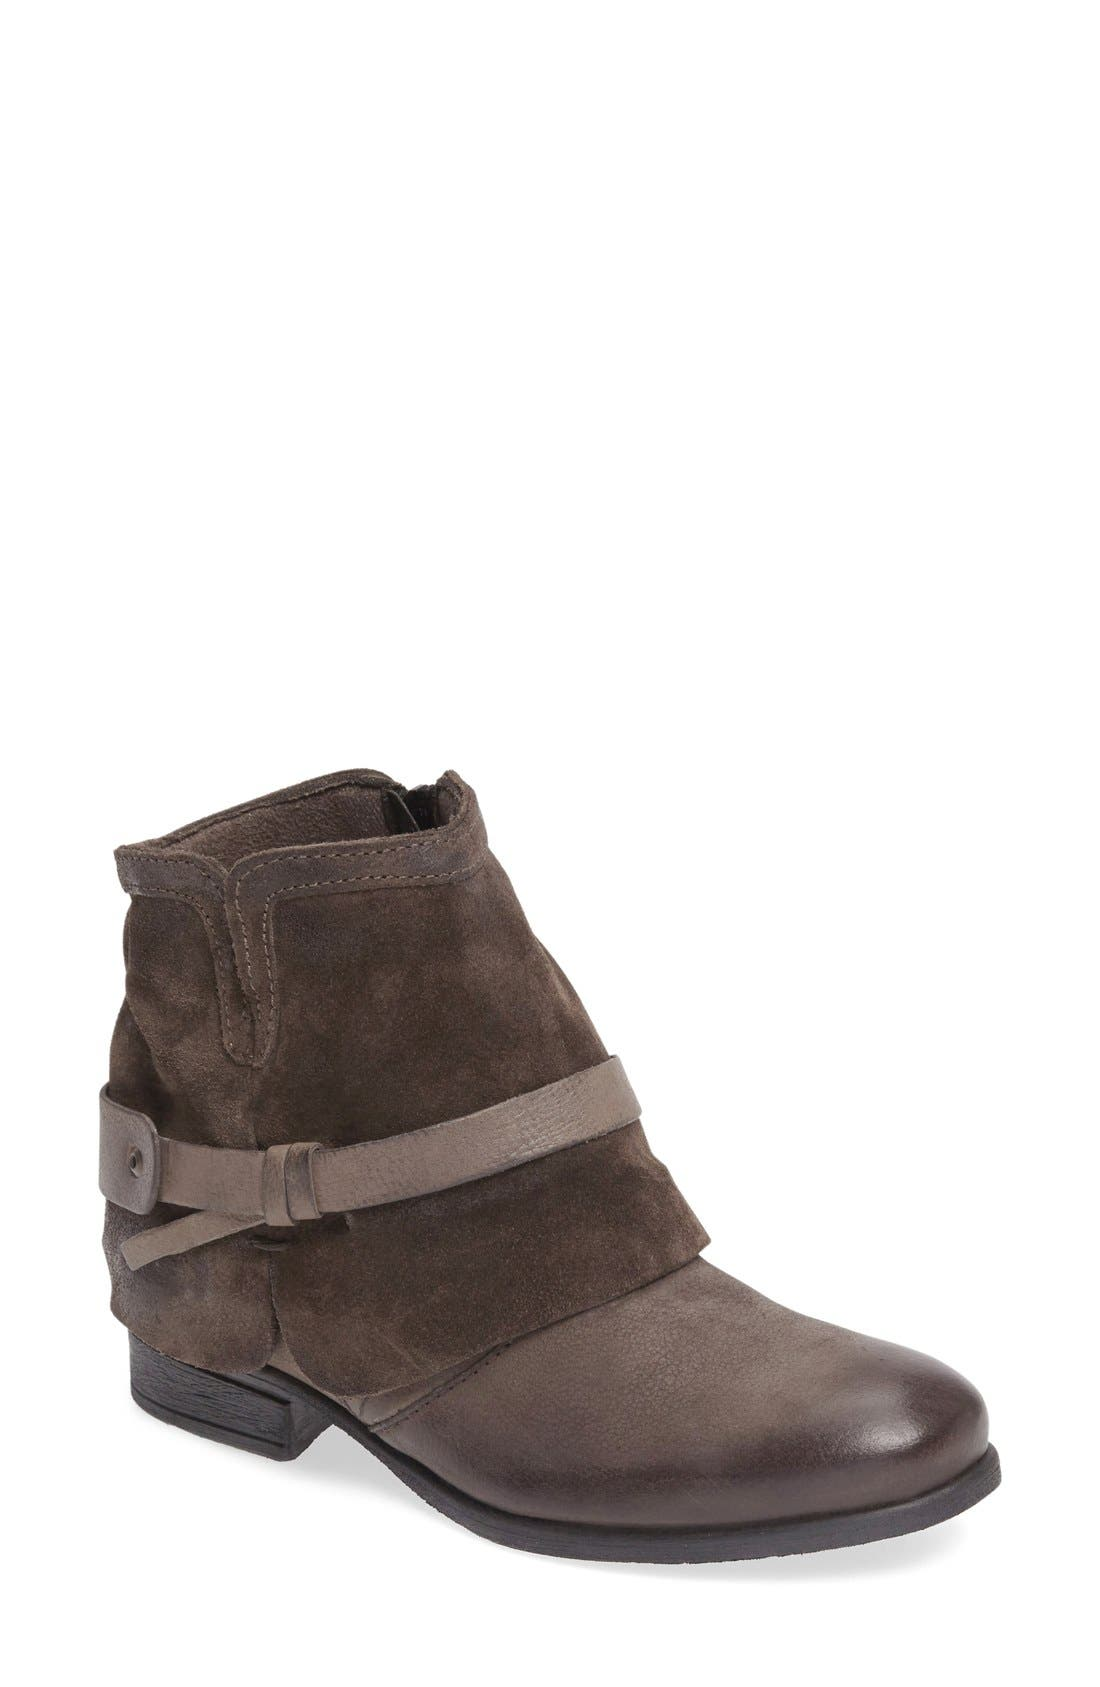 MIZ MOOZ 'Seymour' Boot